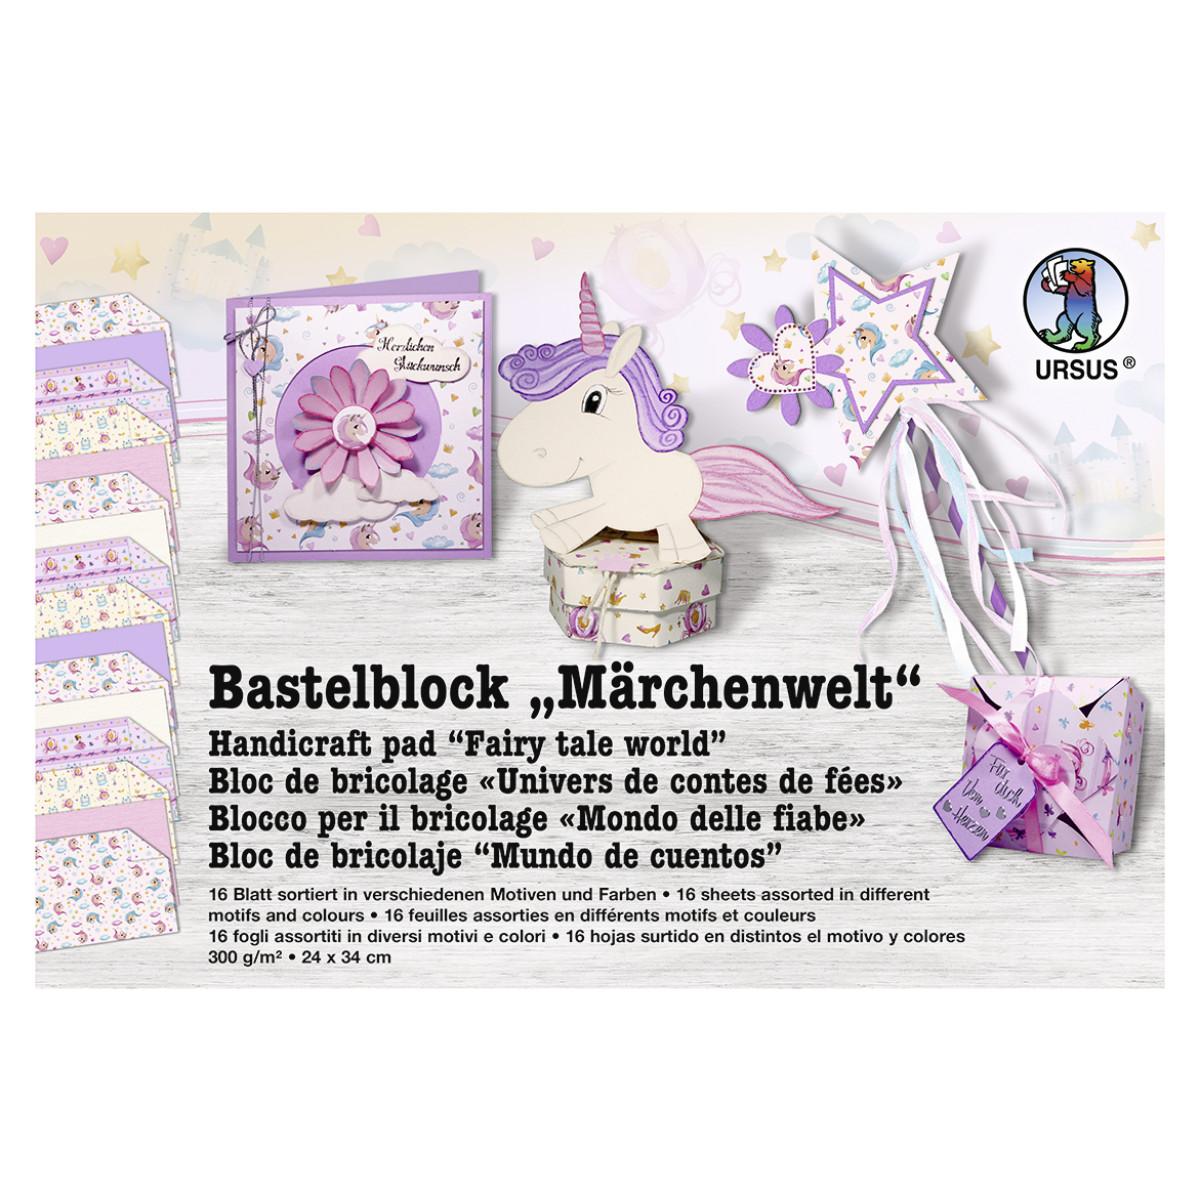 "Bastelblock ""Märchenwelt"" 24 x 34 cm - 16 Blatt"